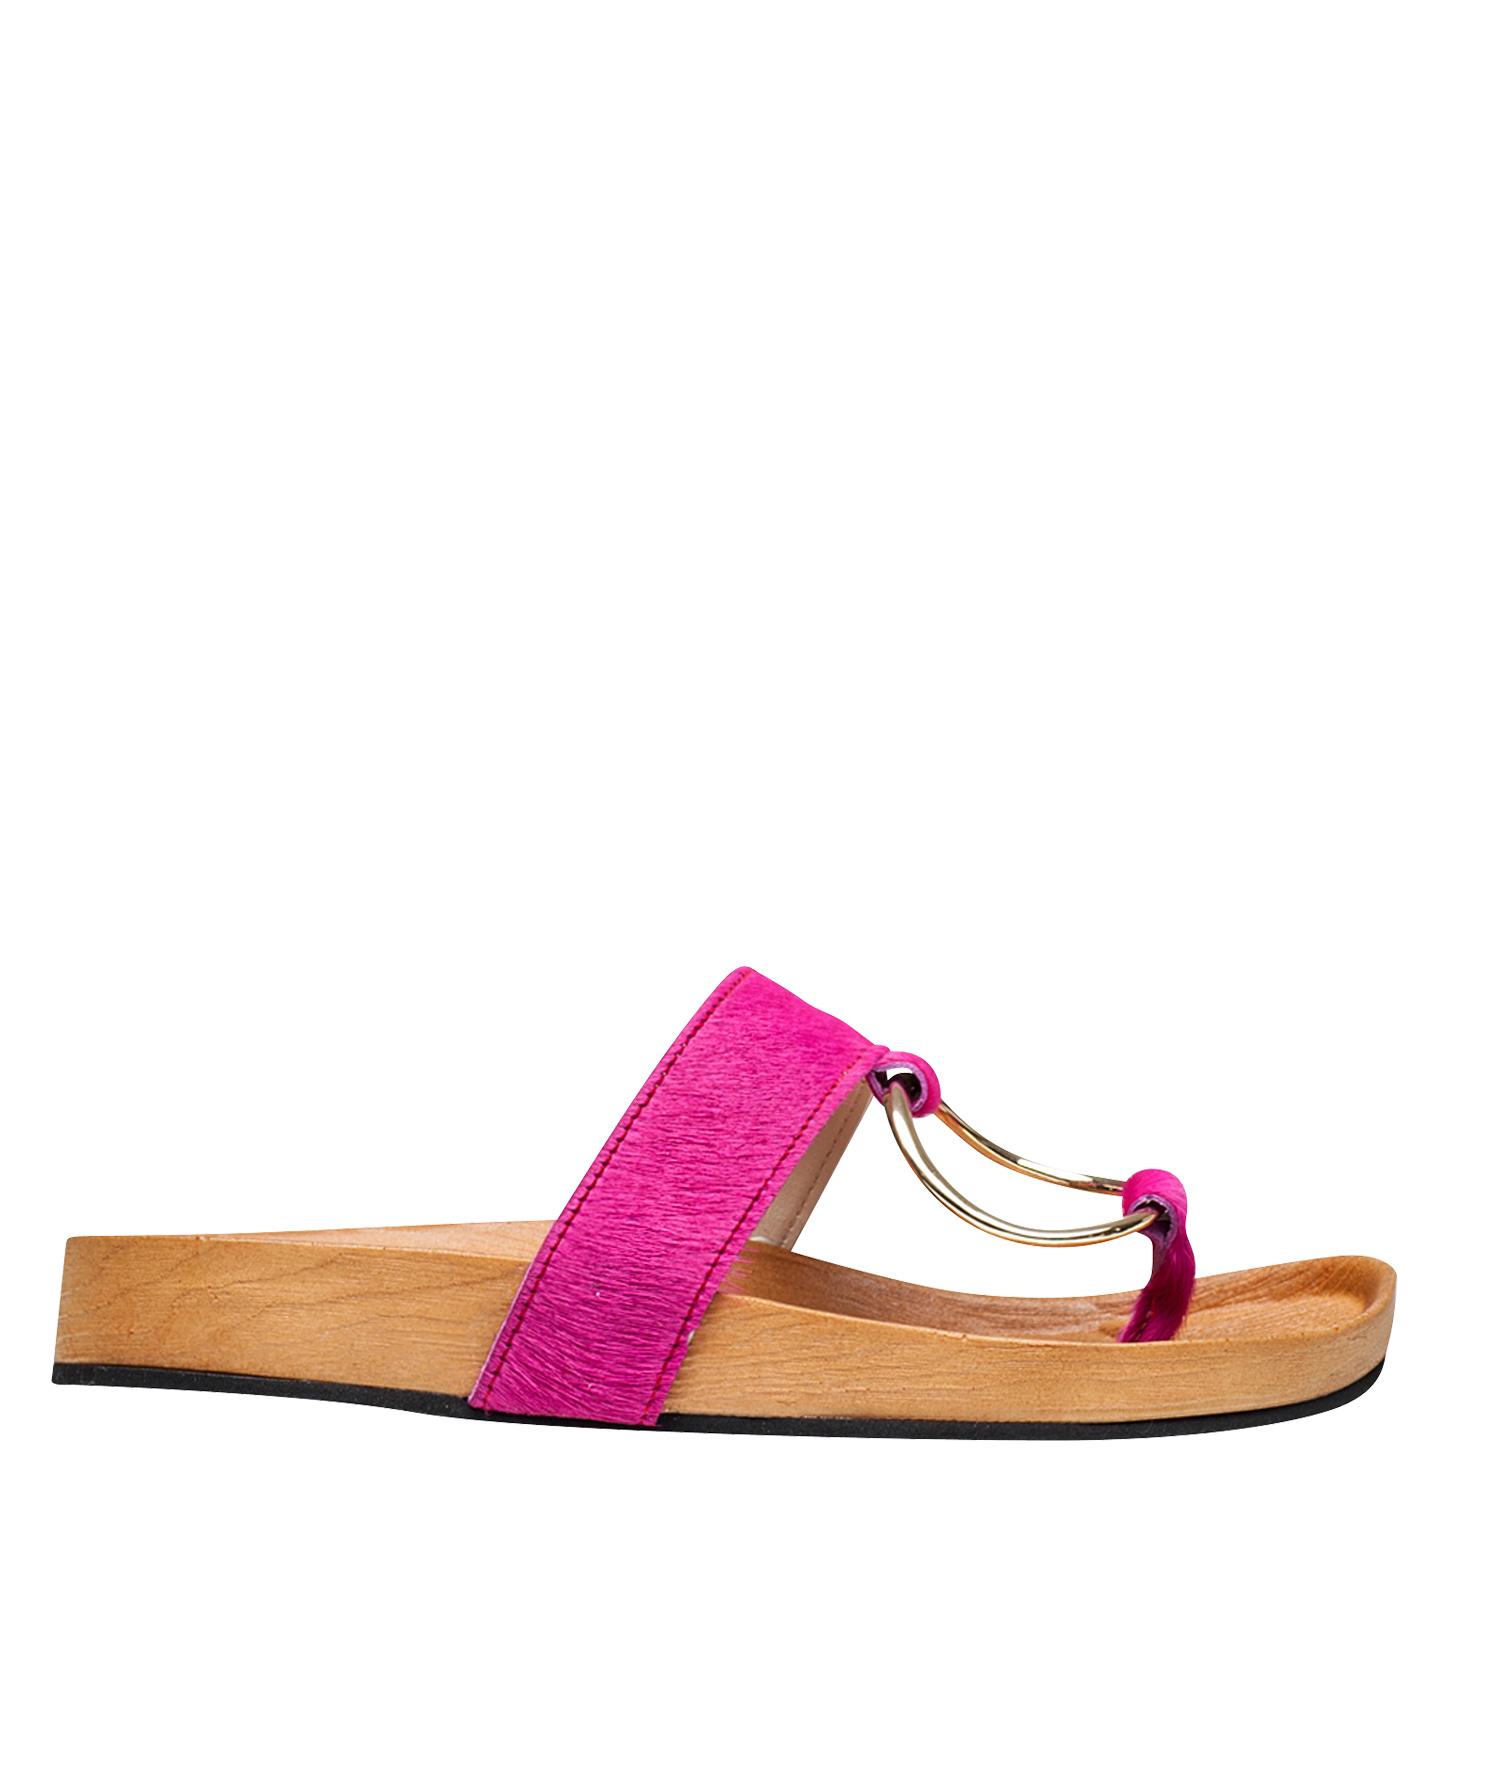 9bb355d004ebc AnnaKastle Womens Calf Hair Ring Thong Sandal Slide Flip Flops Pink